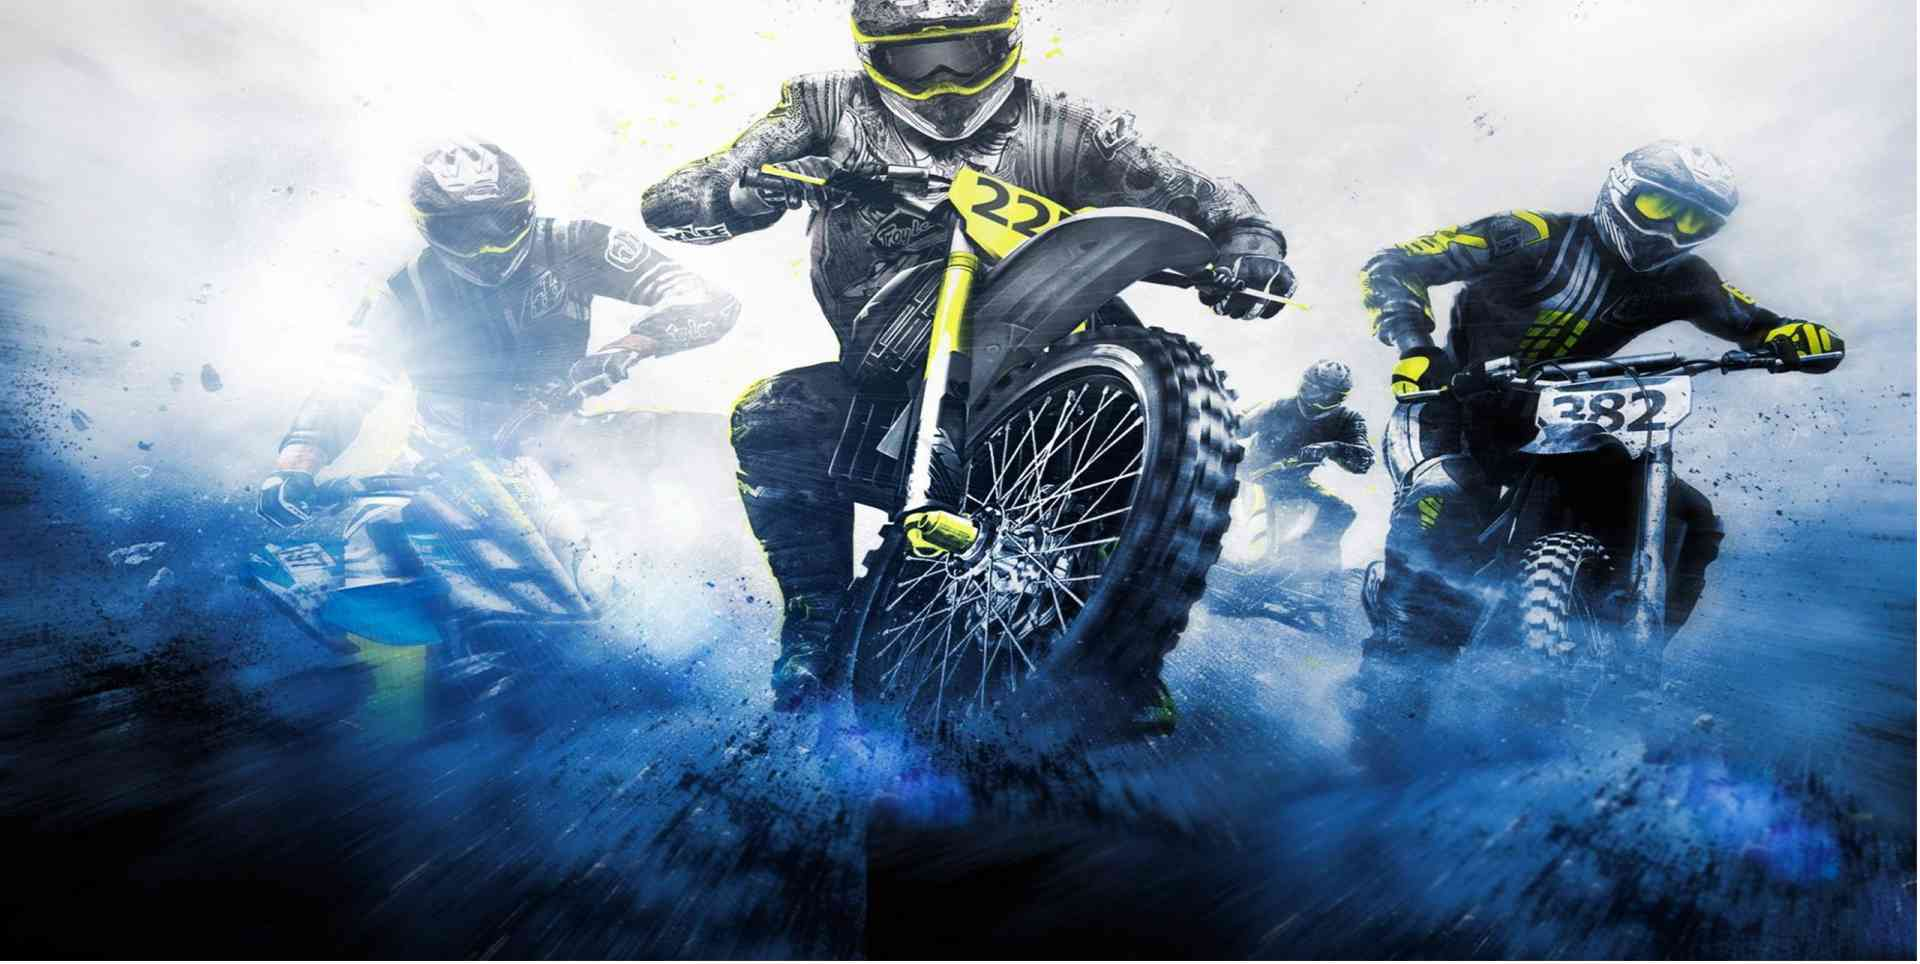 MXGP of Belgium 2020 Live Stream